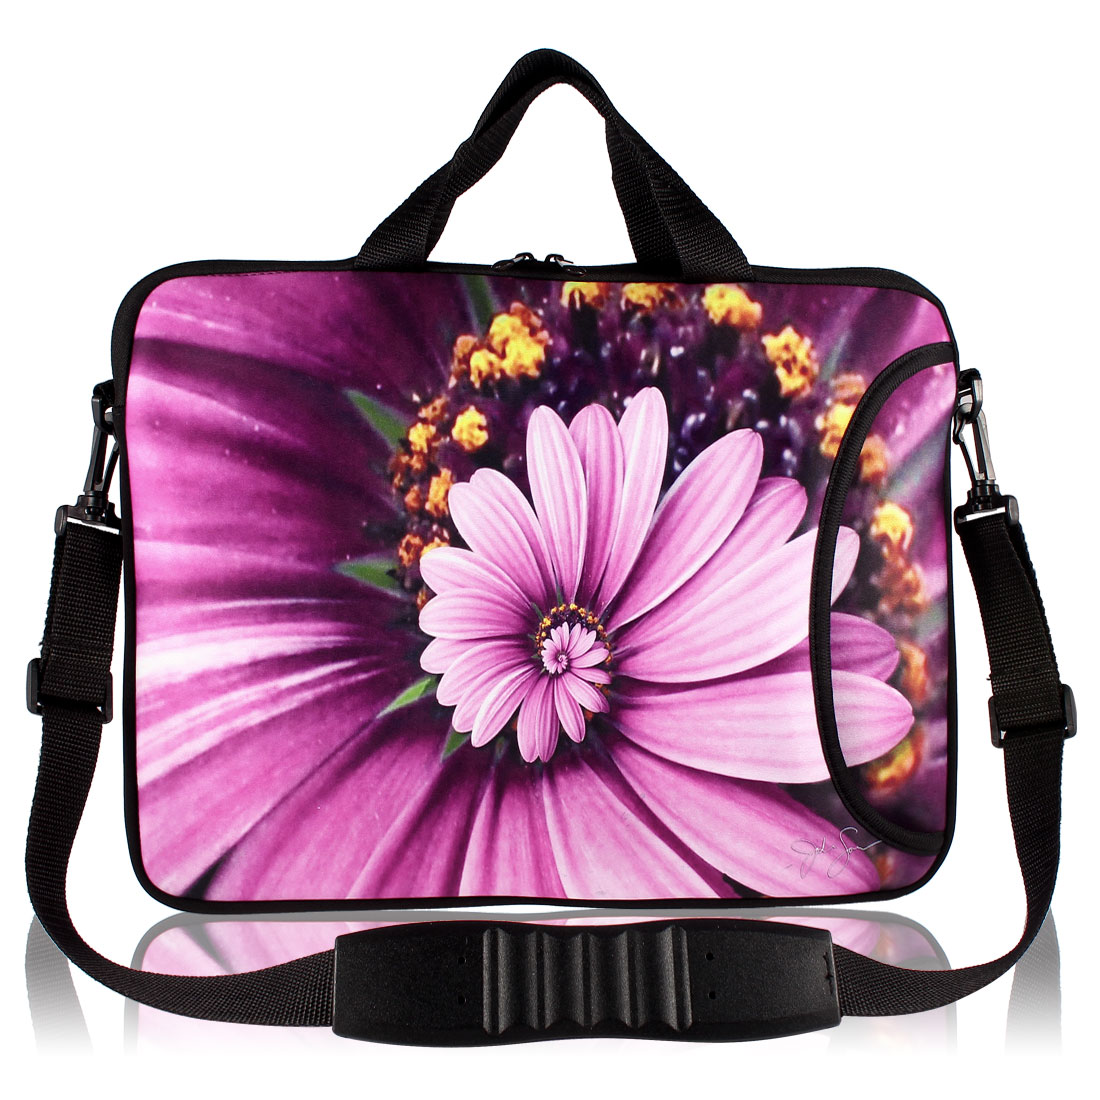 "13"" 13.3"" Fuchsia Chrysanthemum Printed Laptop Sleeve Handle Bag Case"